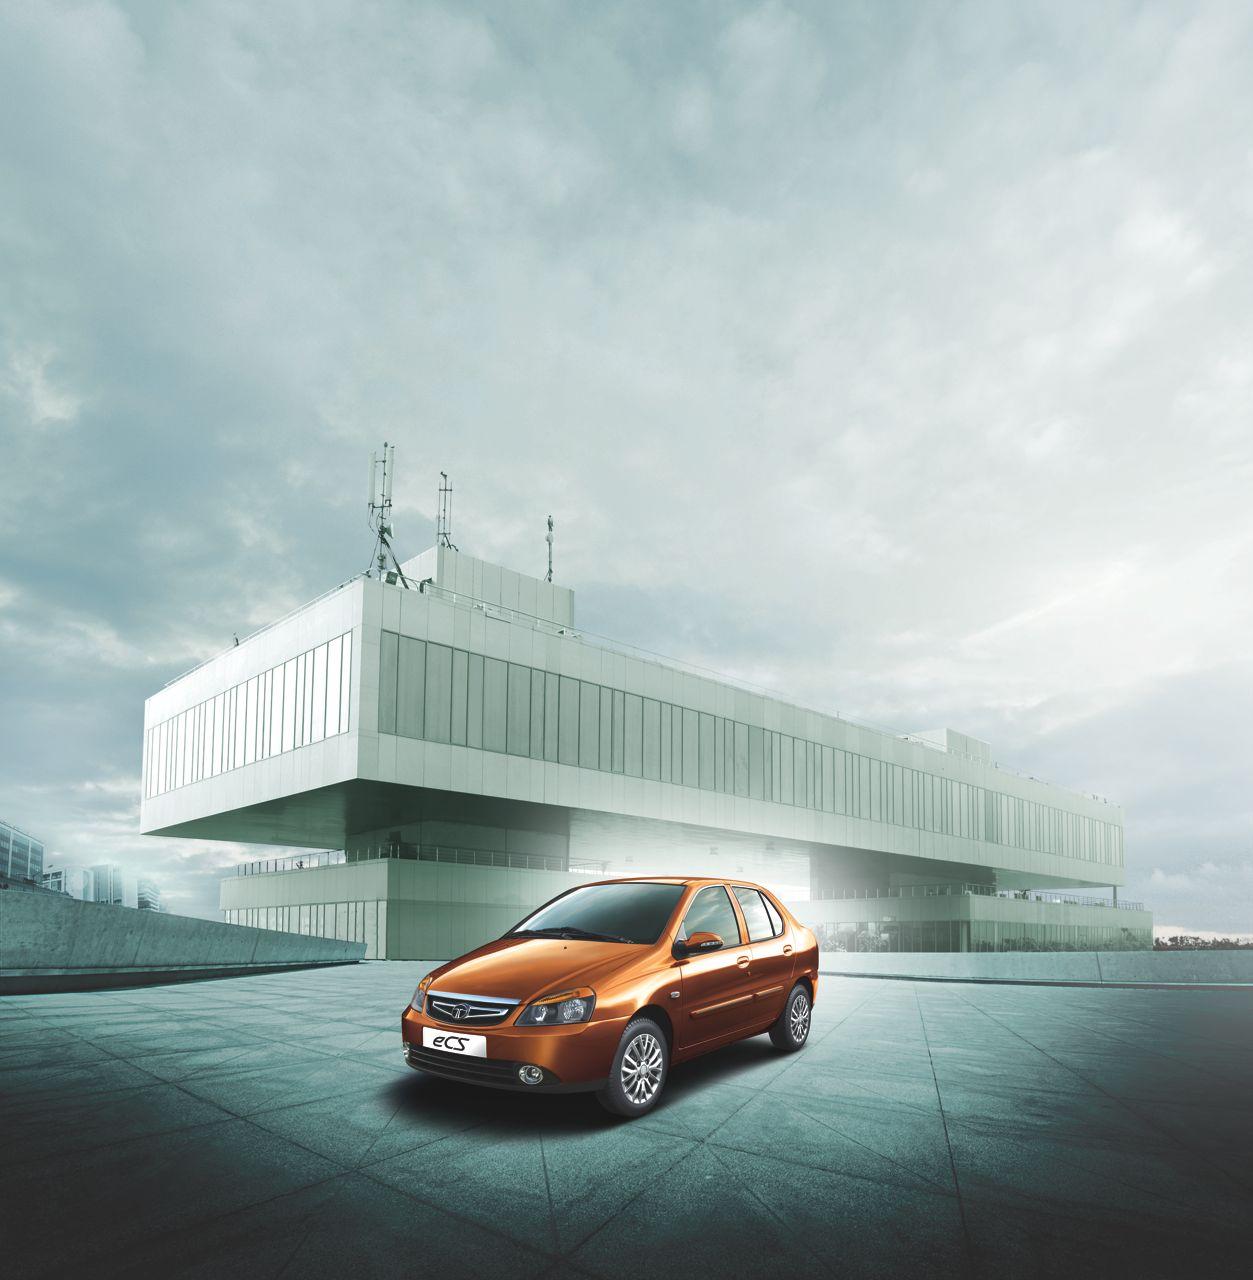 2013-Tata-Indigo-eCS-profile